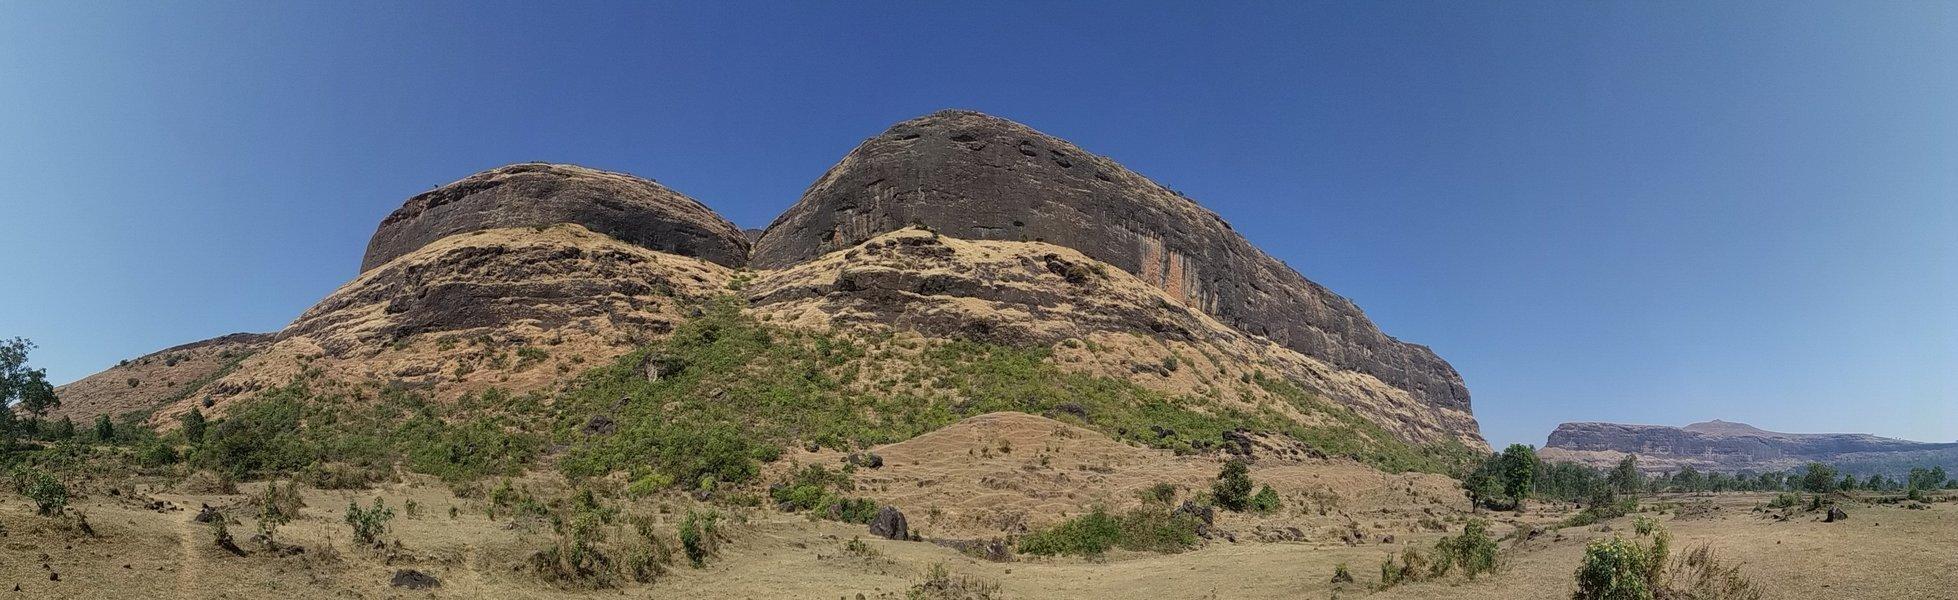 VRangers Trek To Hadsar Fort via Khilyachi waat & Chavand fort - Tour